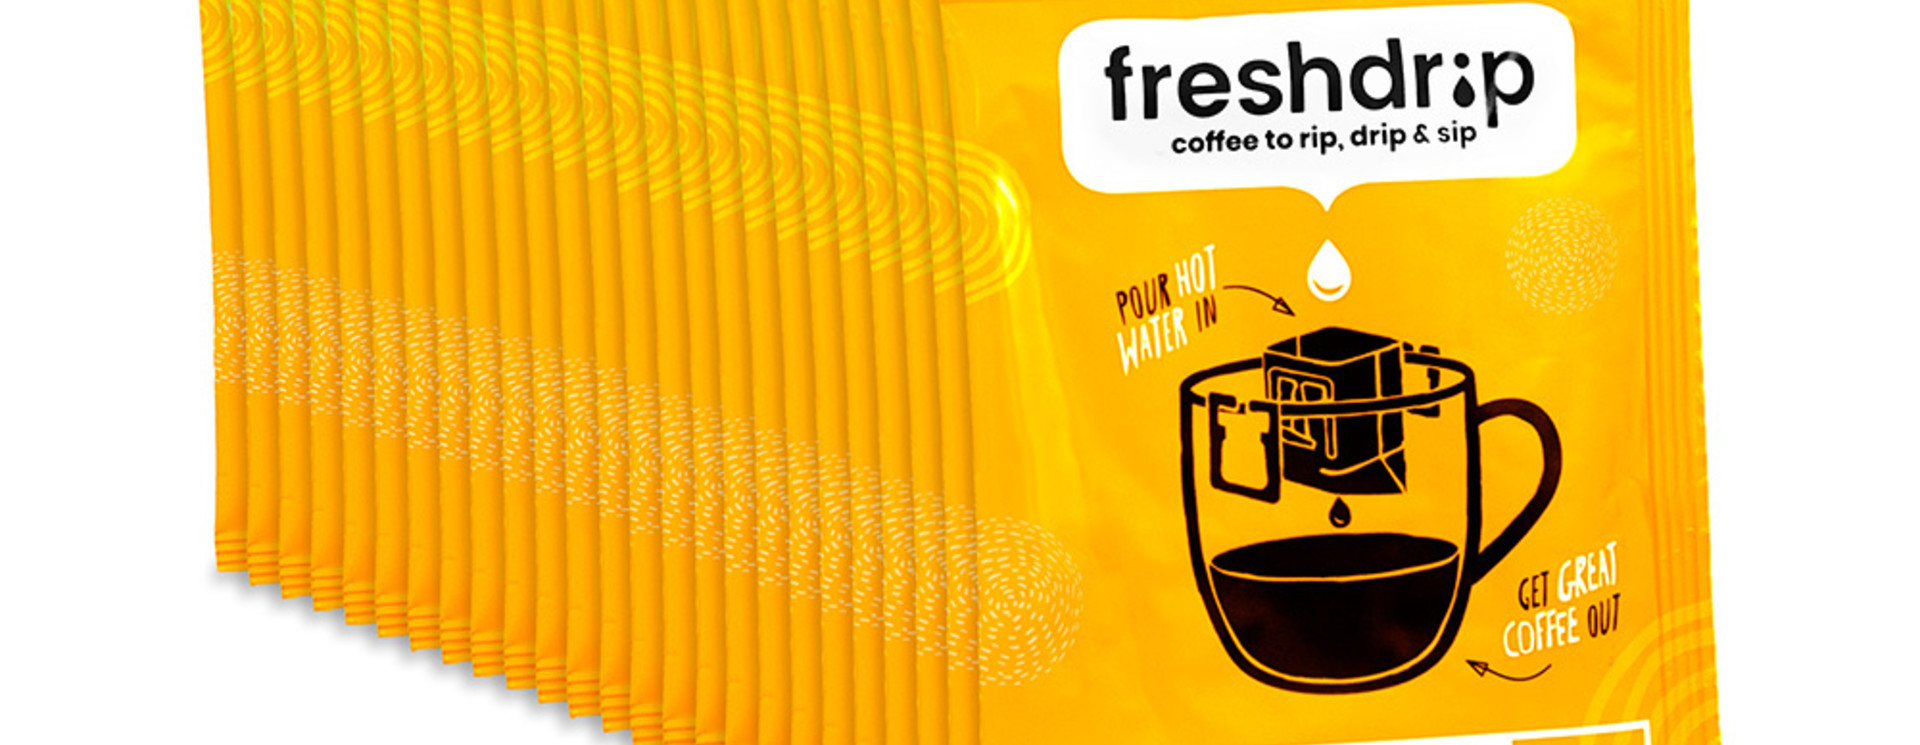 Freshdrip Medium Box With 50 Coffee Filters